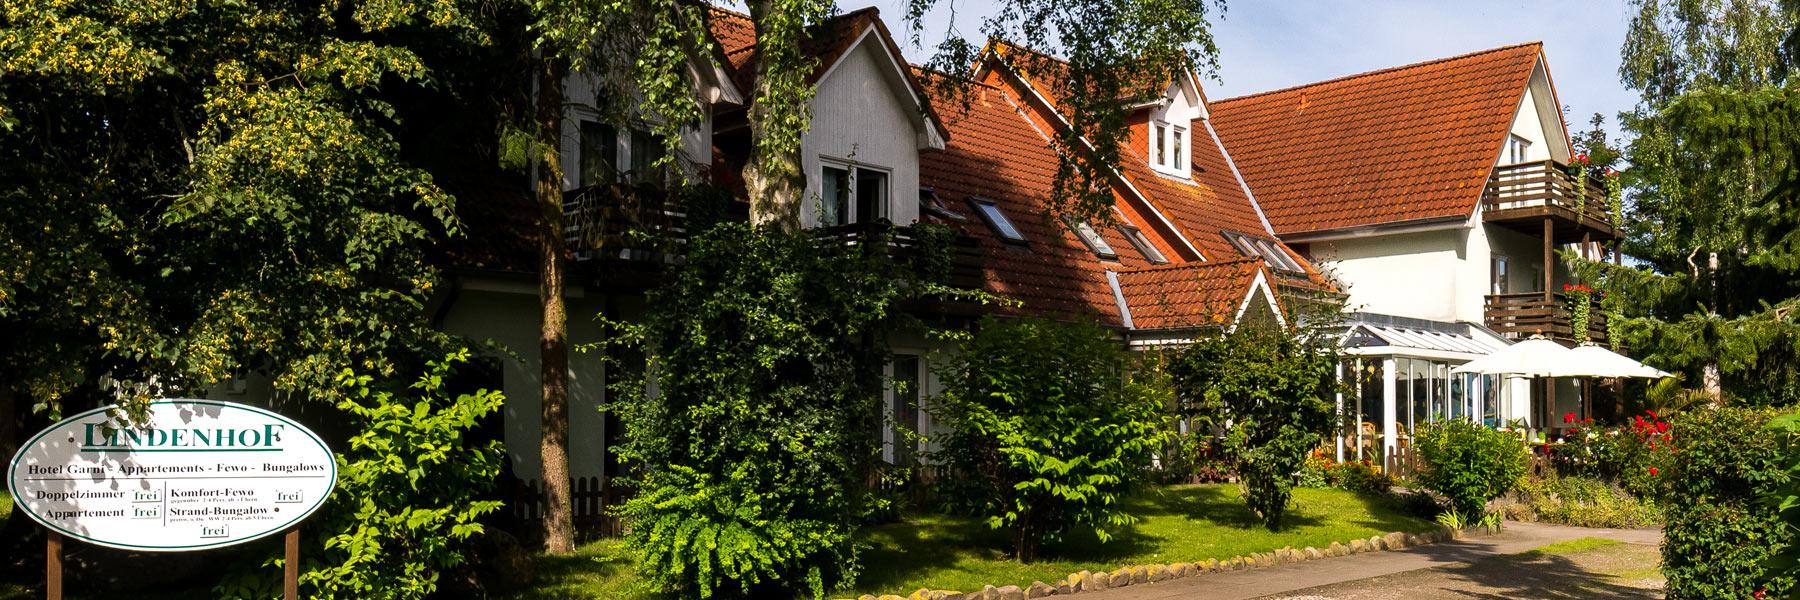 Aussenaufnahme - Lindenhof Pension & Appartements